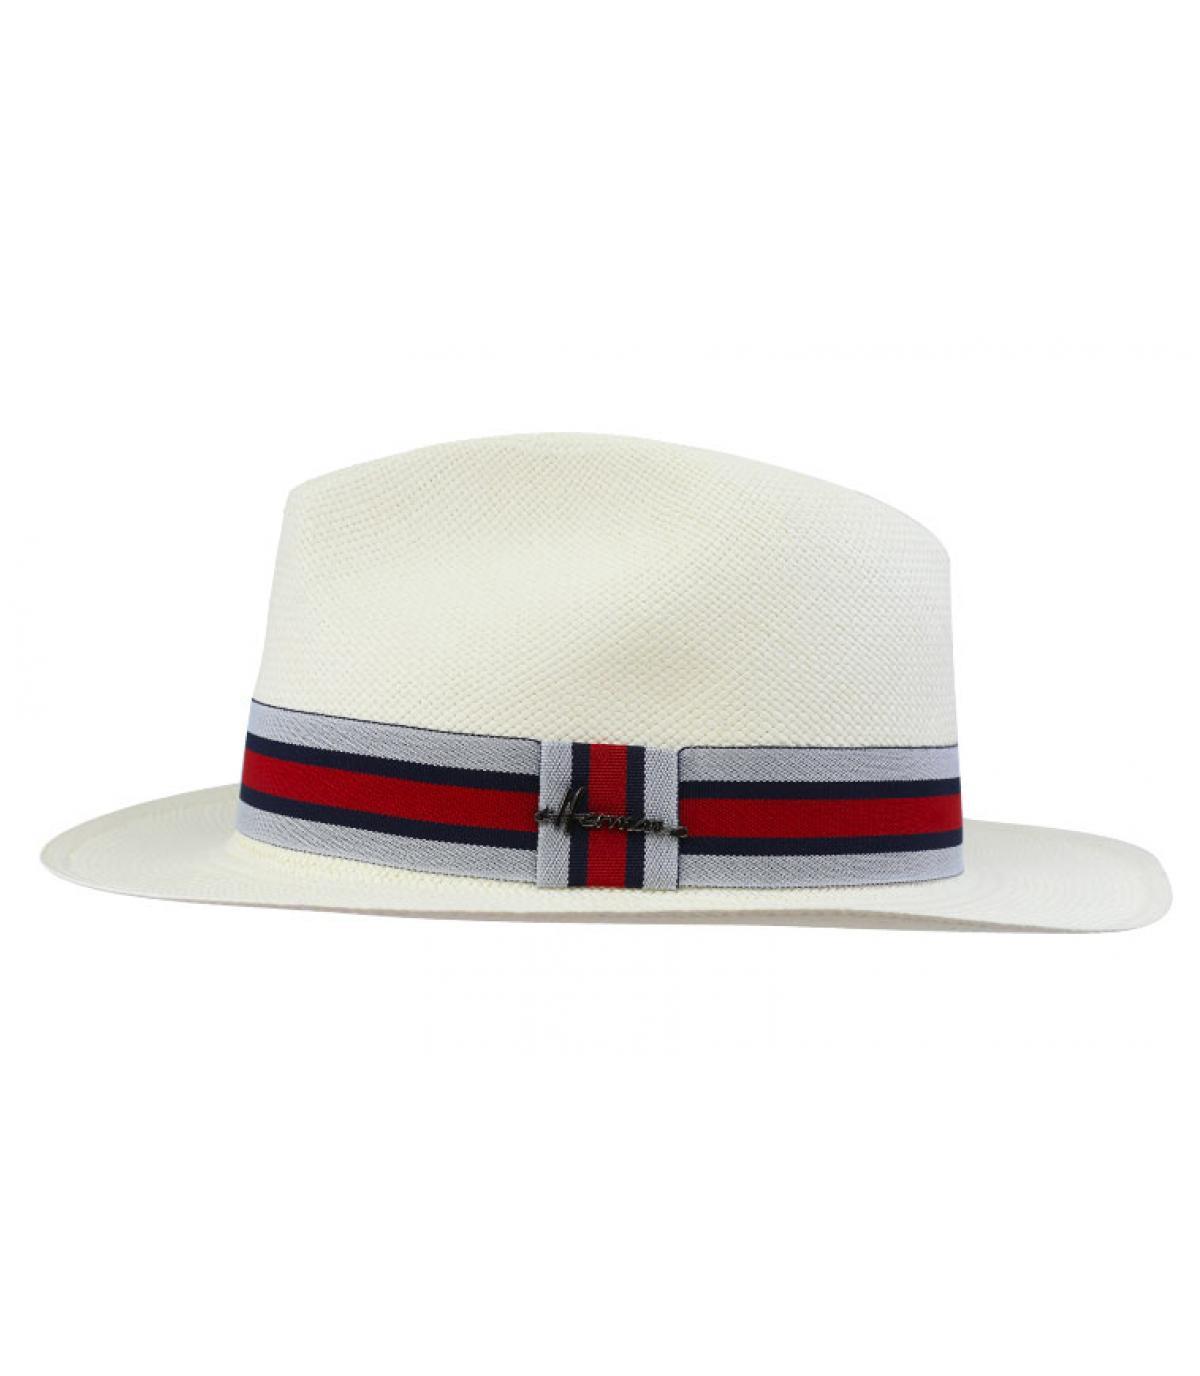 Weiße Panamablanc rotes Hutband